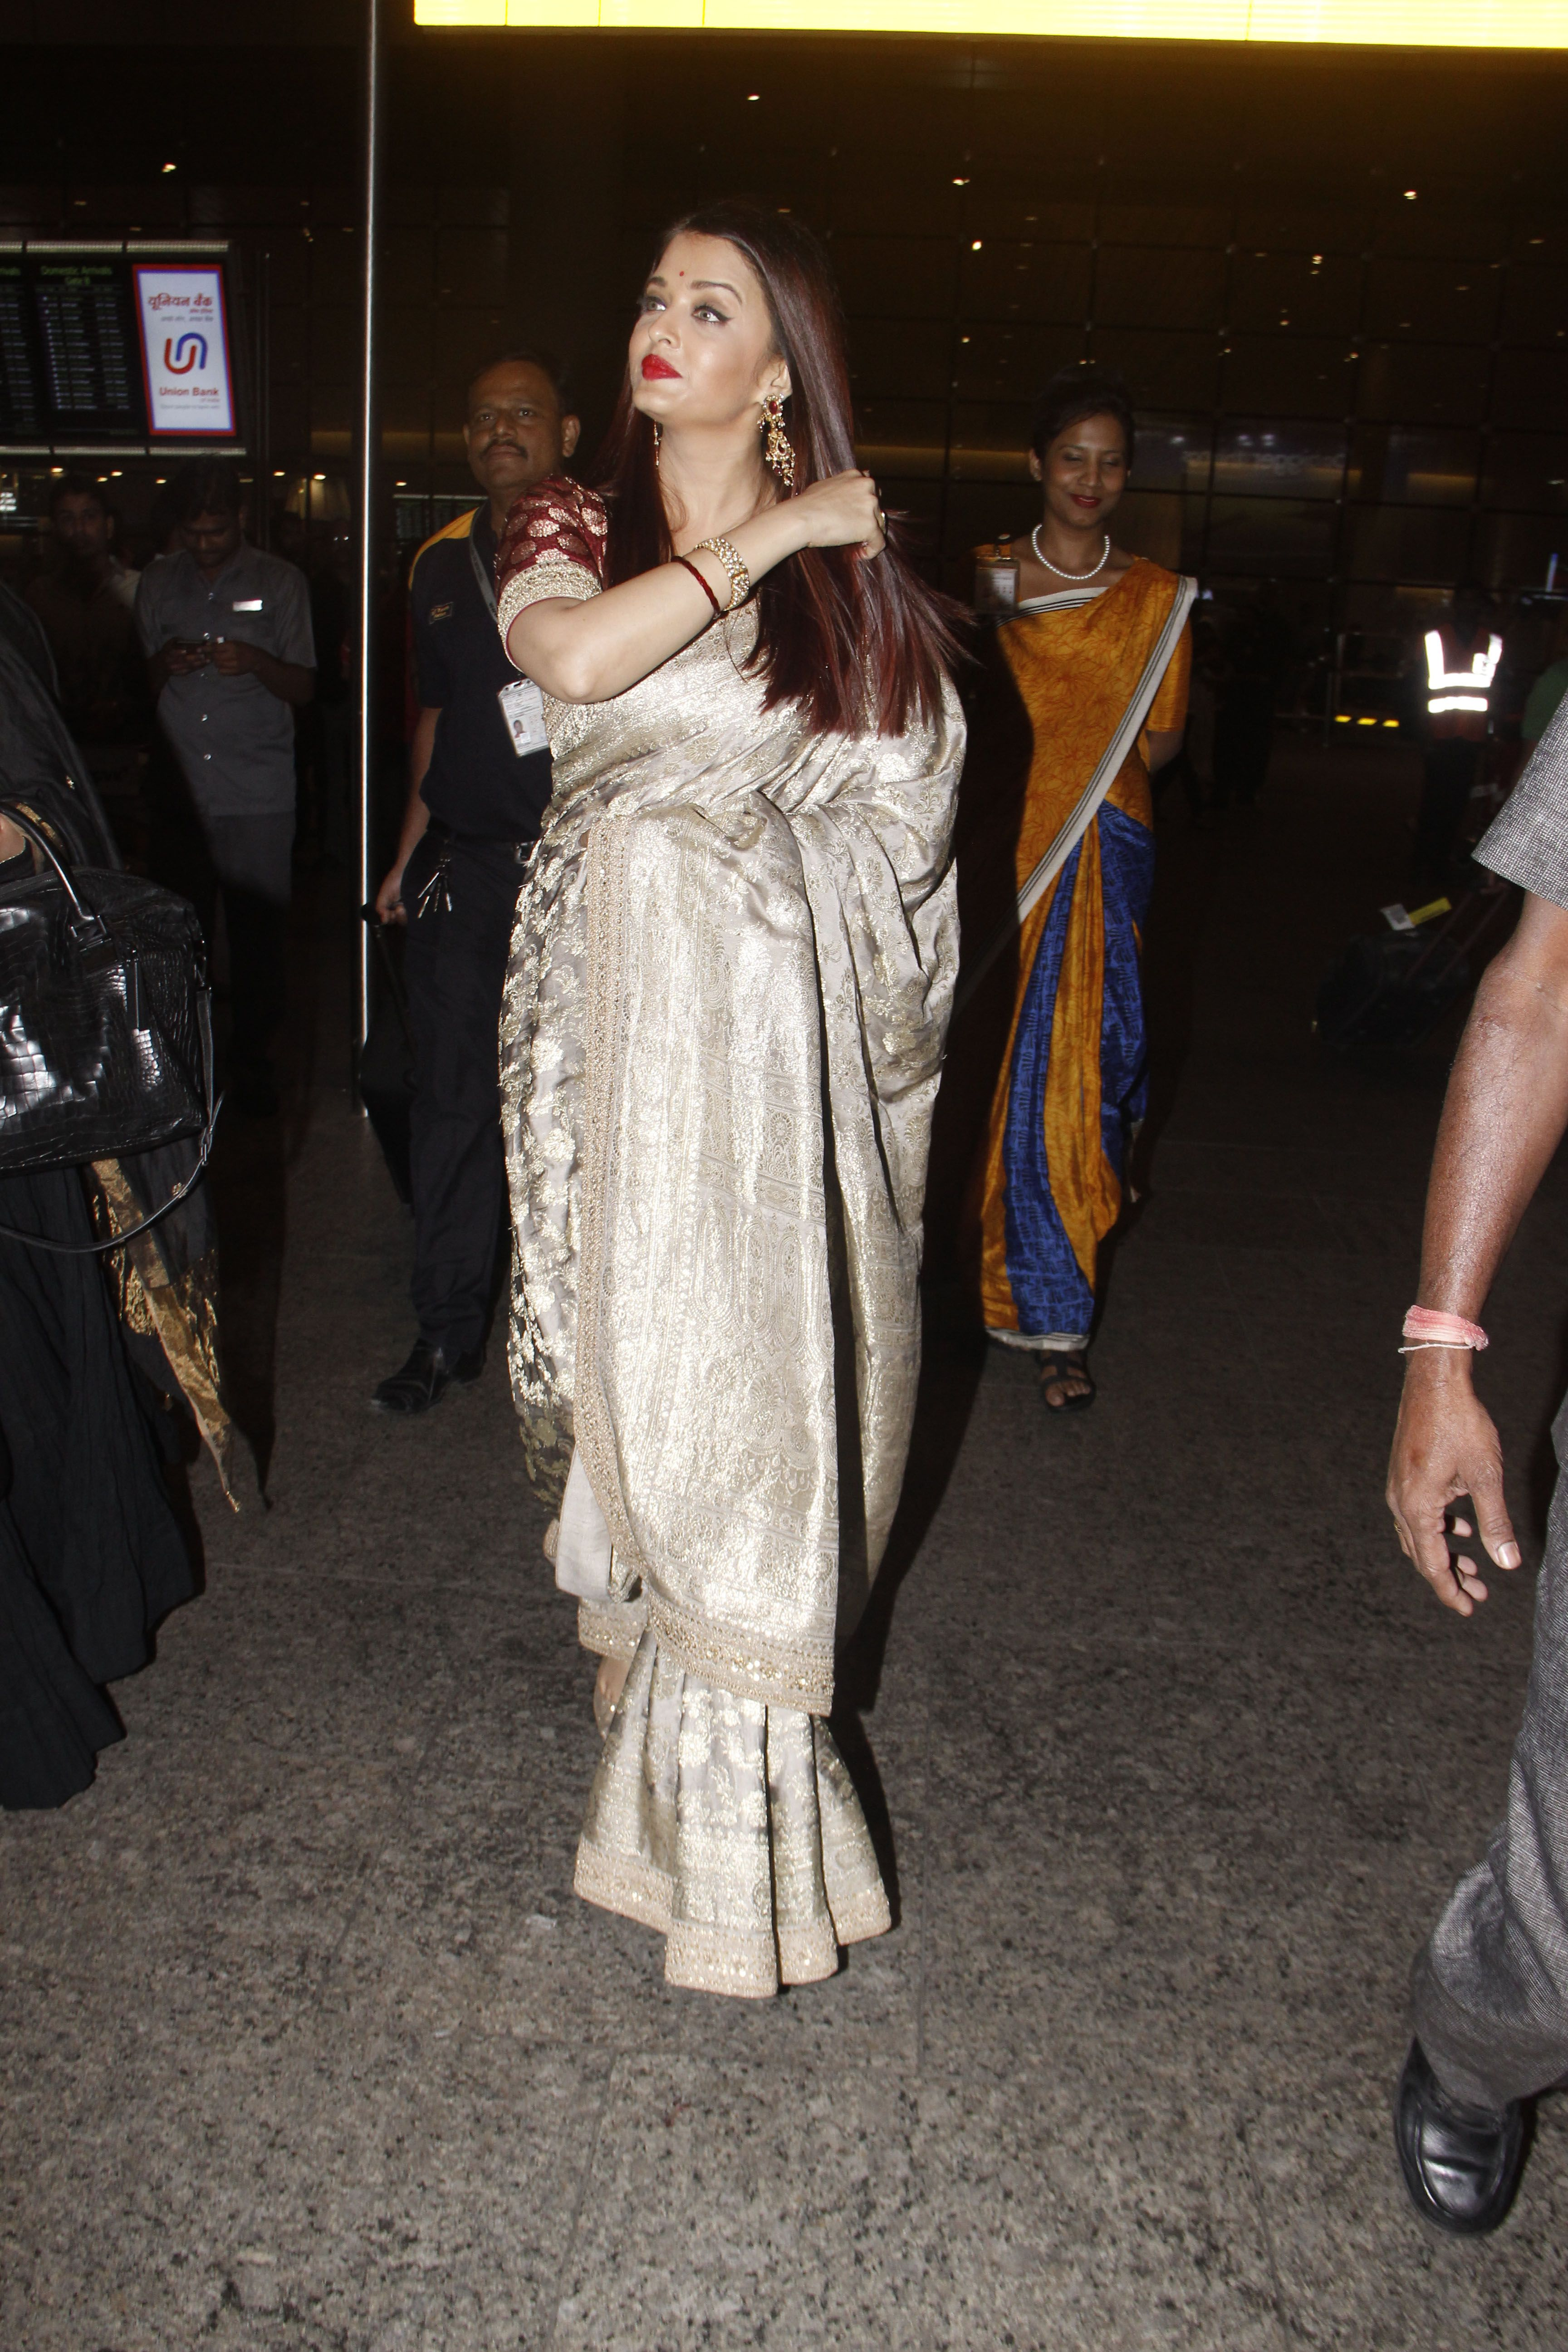 c304a3643296b0 Aishwarya Rai Bachchan Looked Magnificent Metallic Ivory & Gold Sabyasachi  Saree